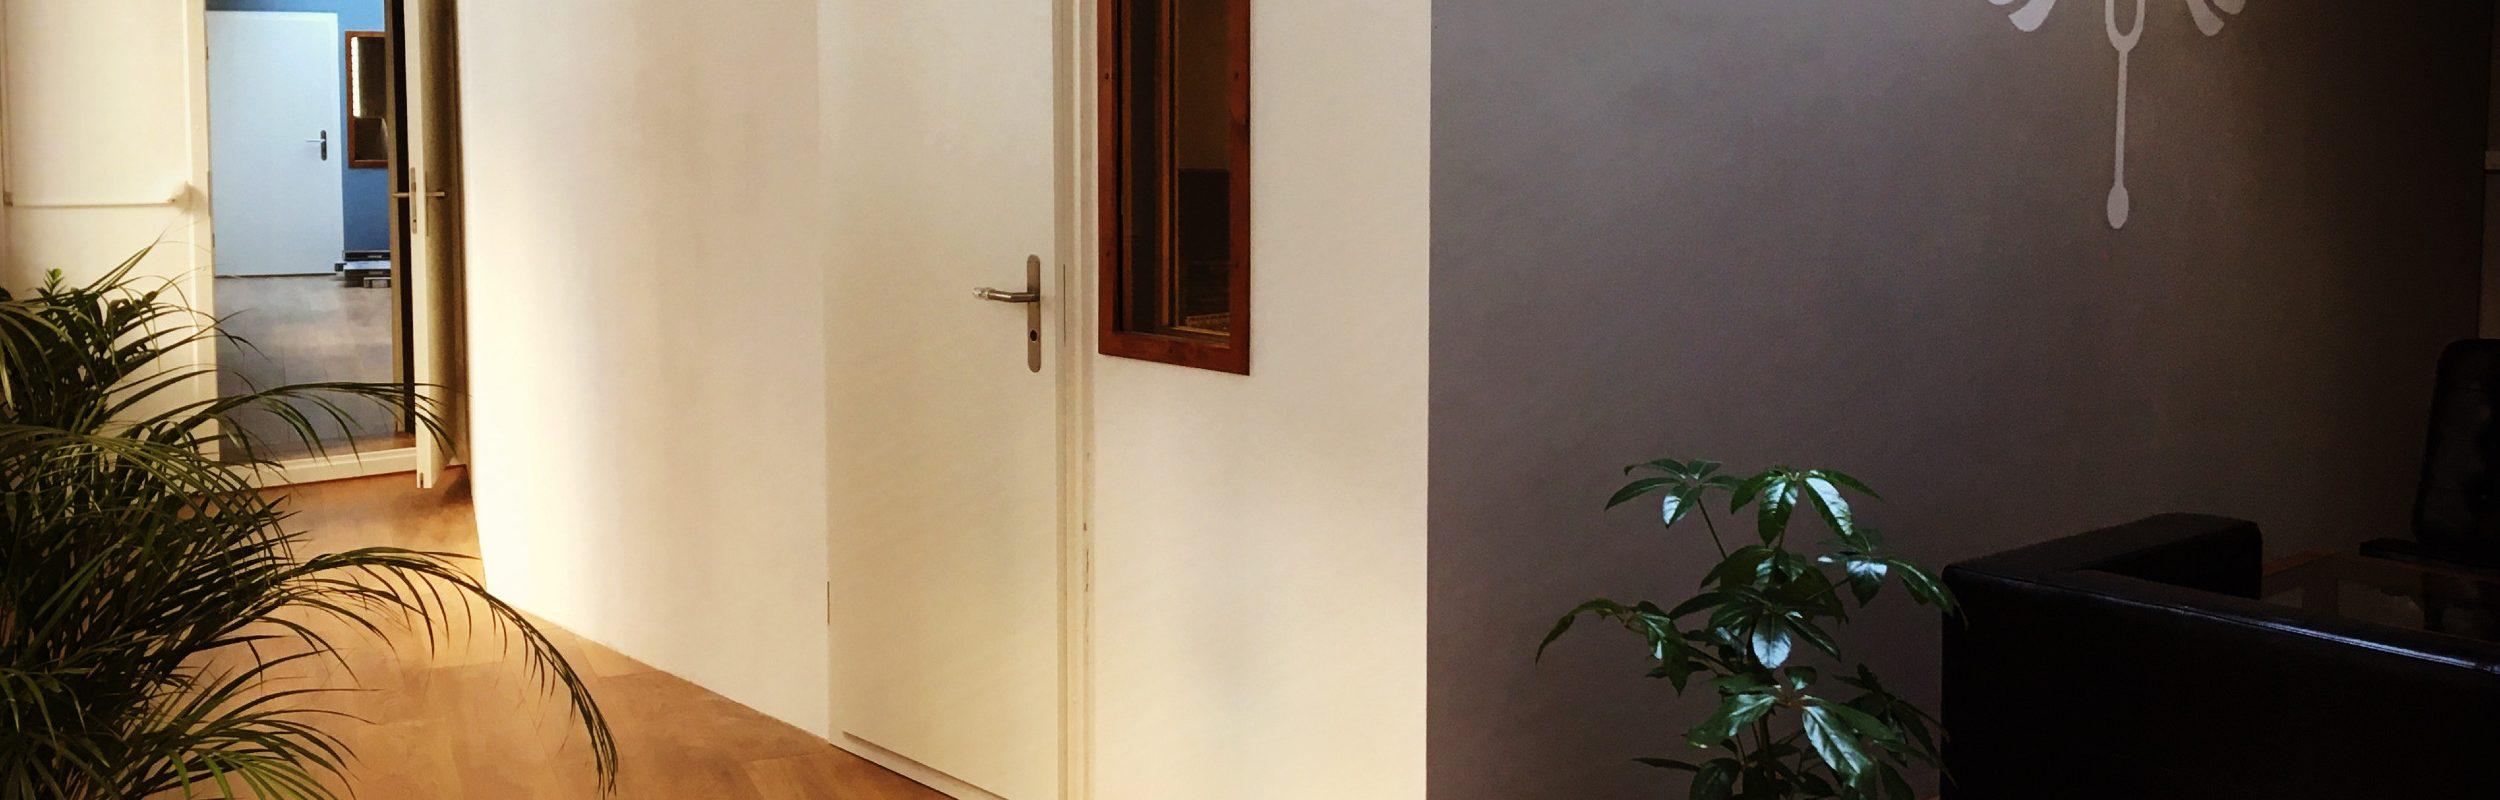 tonstudio-audioflair-bern-entree-aufenthaltsraum-lounge